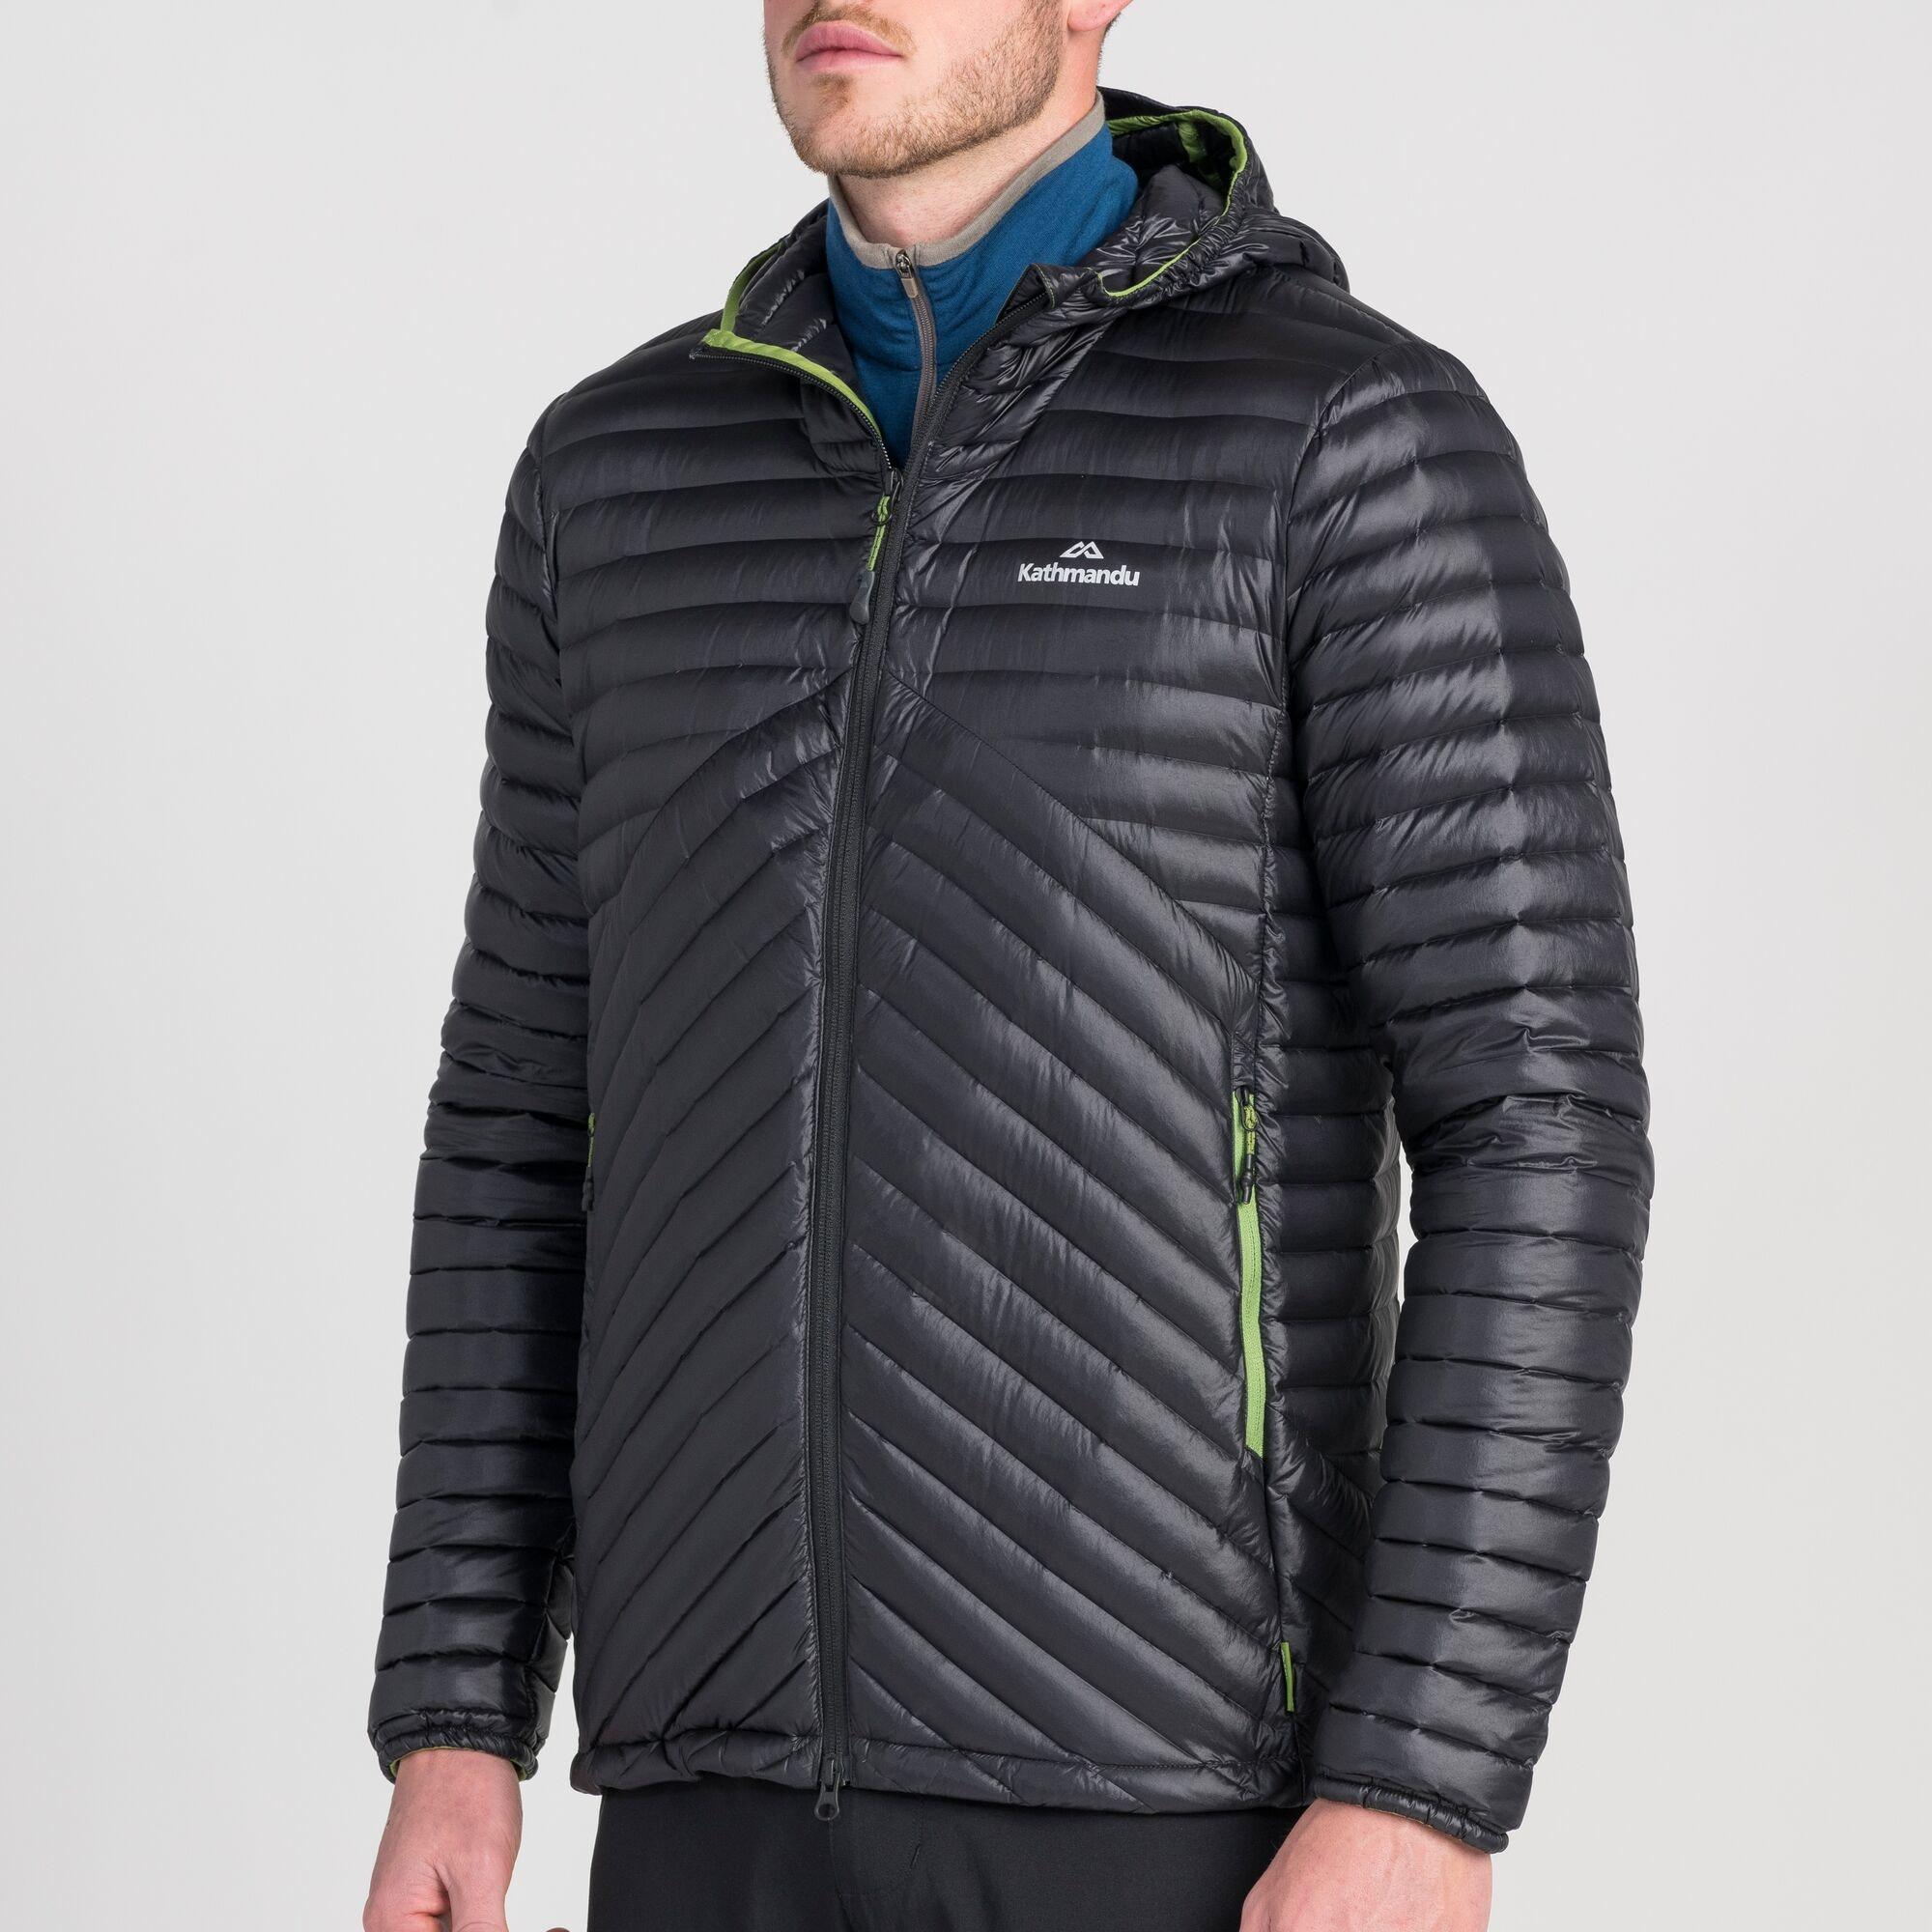 thumbnail 10 - NEW Kathmandu Flinders Lightweight Water-Repellent Warm Men's Down Puffer Jacket